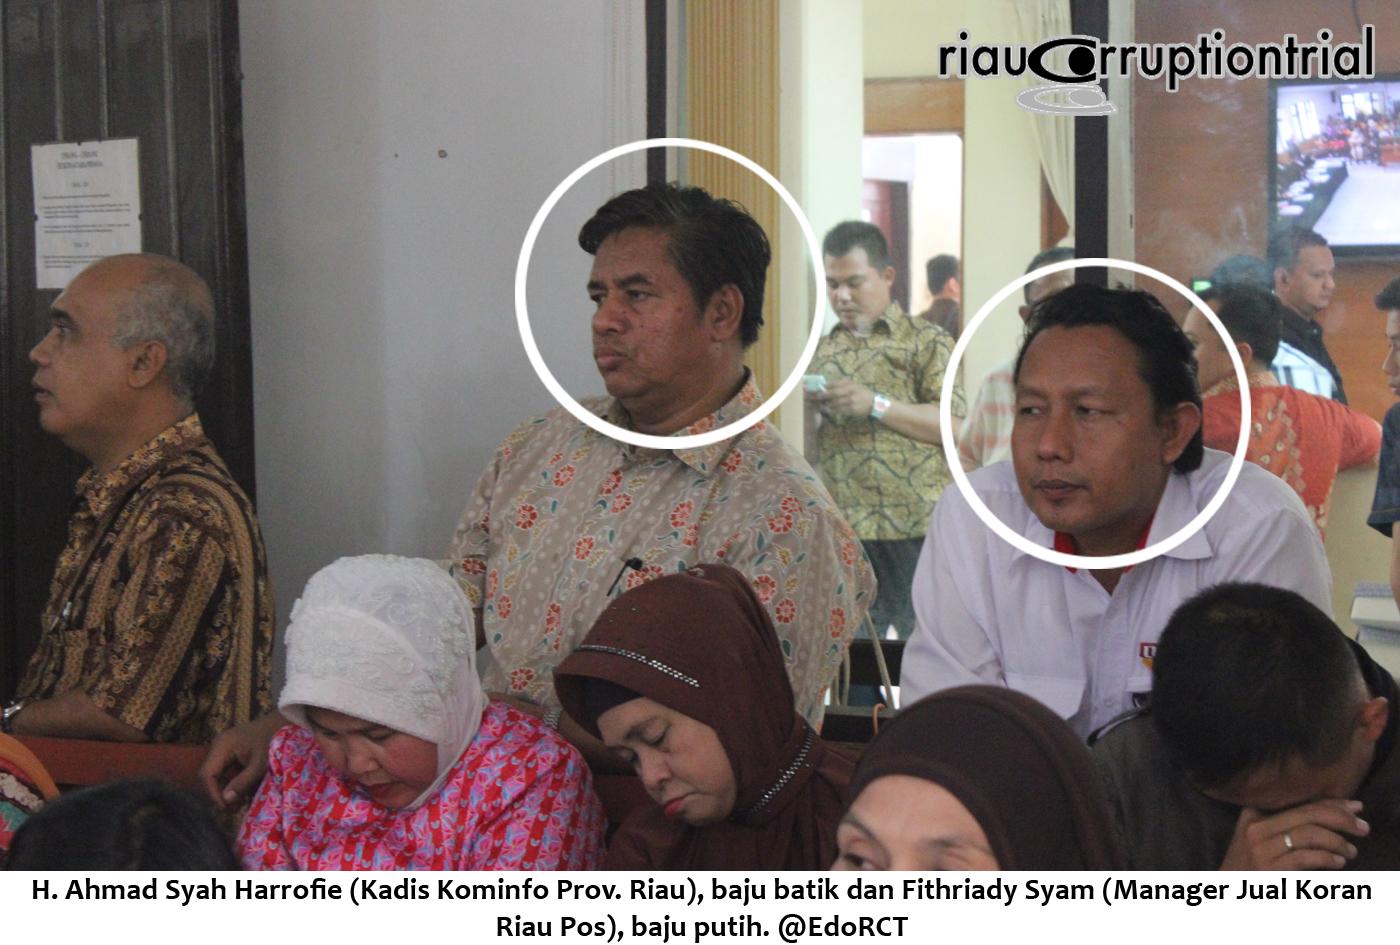 Kadis Kominfo dan manager jual koran riau pos hadir saat sidang RZ